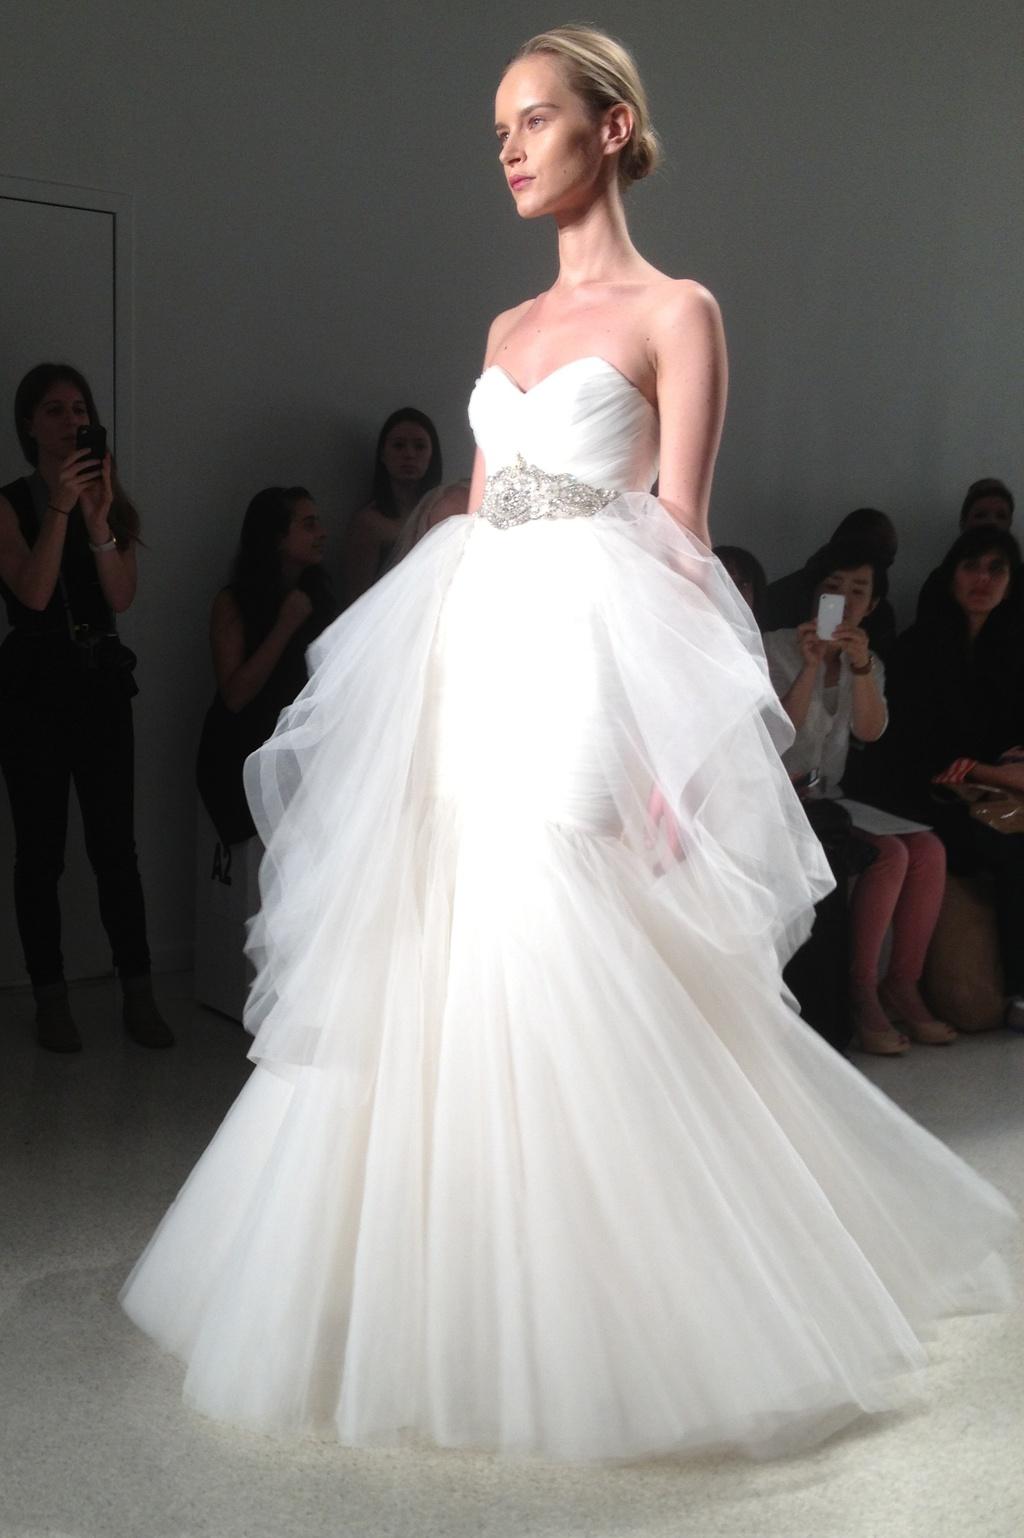 Kenneth-pool-2014-wedding-dress-tulle-ballgown.full